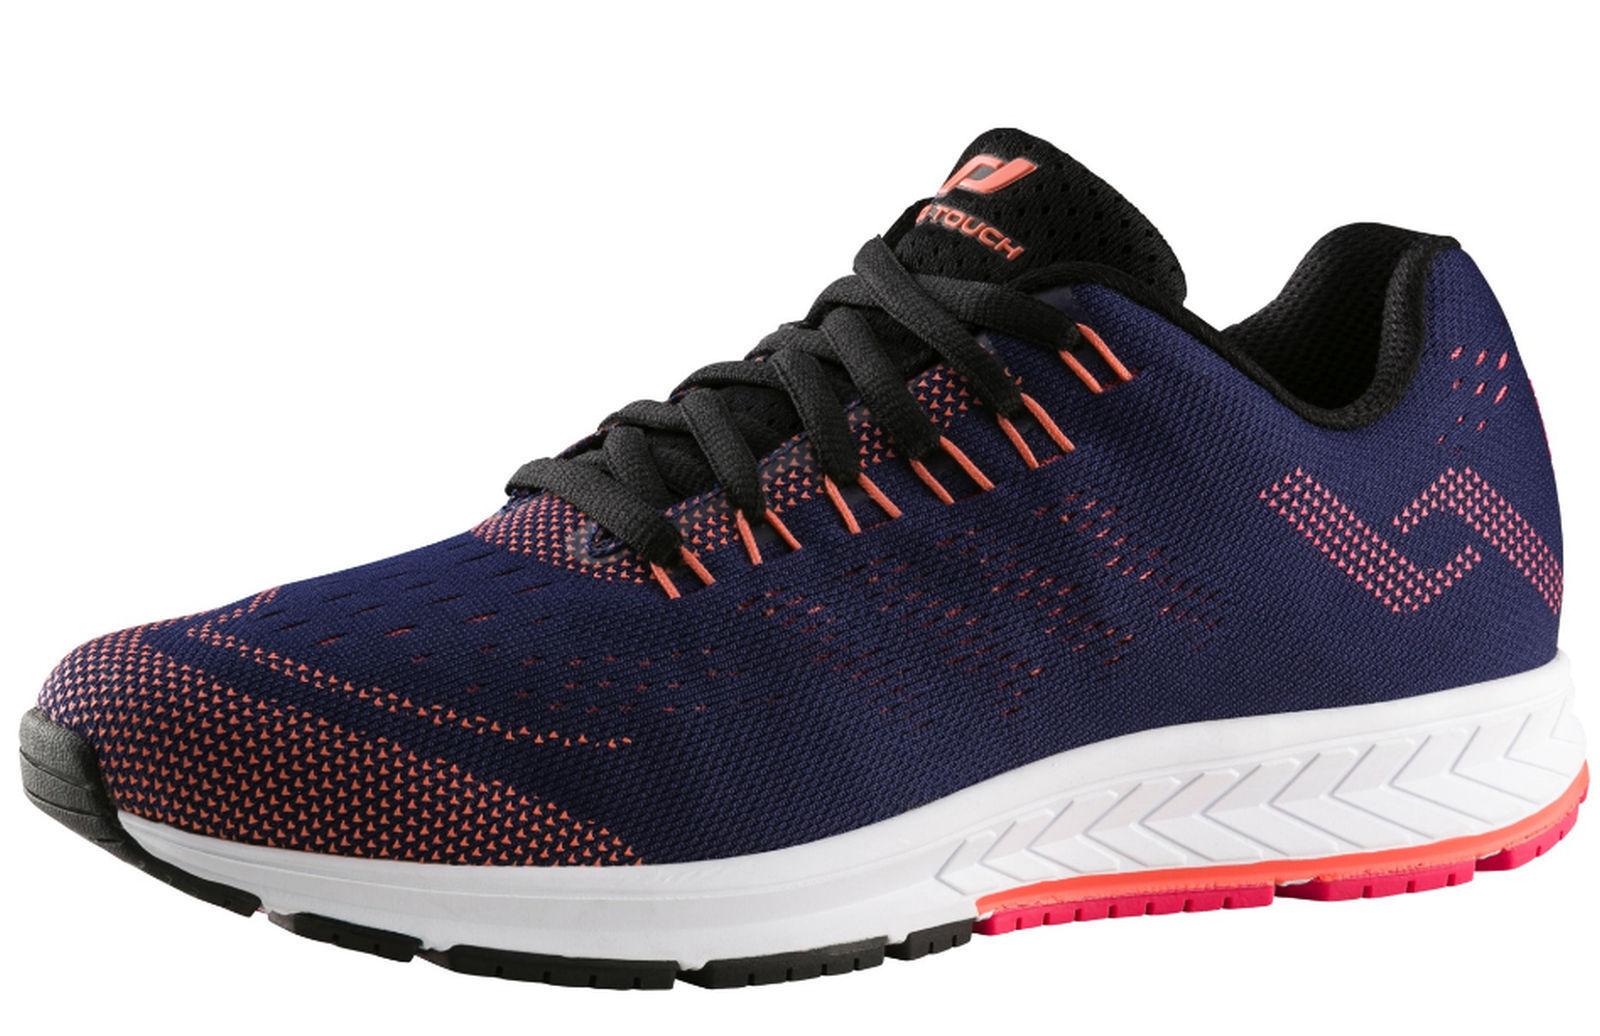 Pro Touch Damen Laufschuh OZ 2.0 W blau rot pink